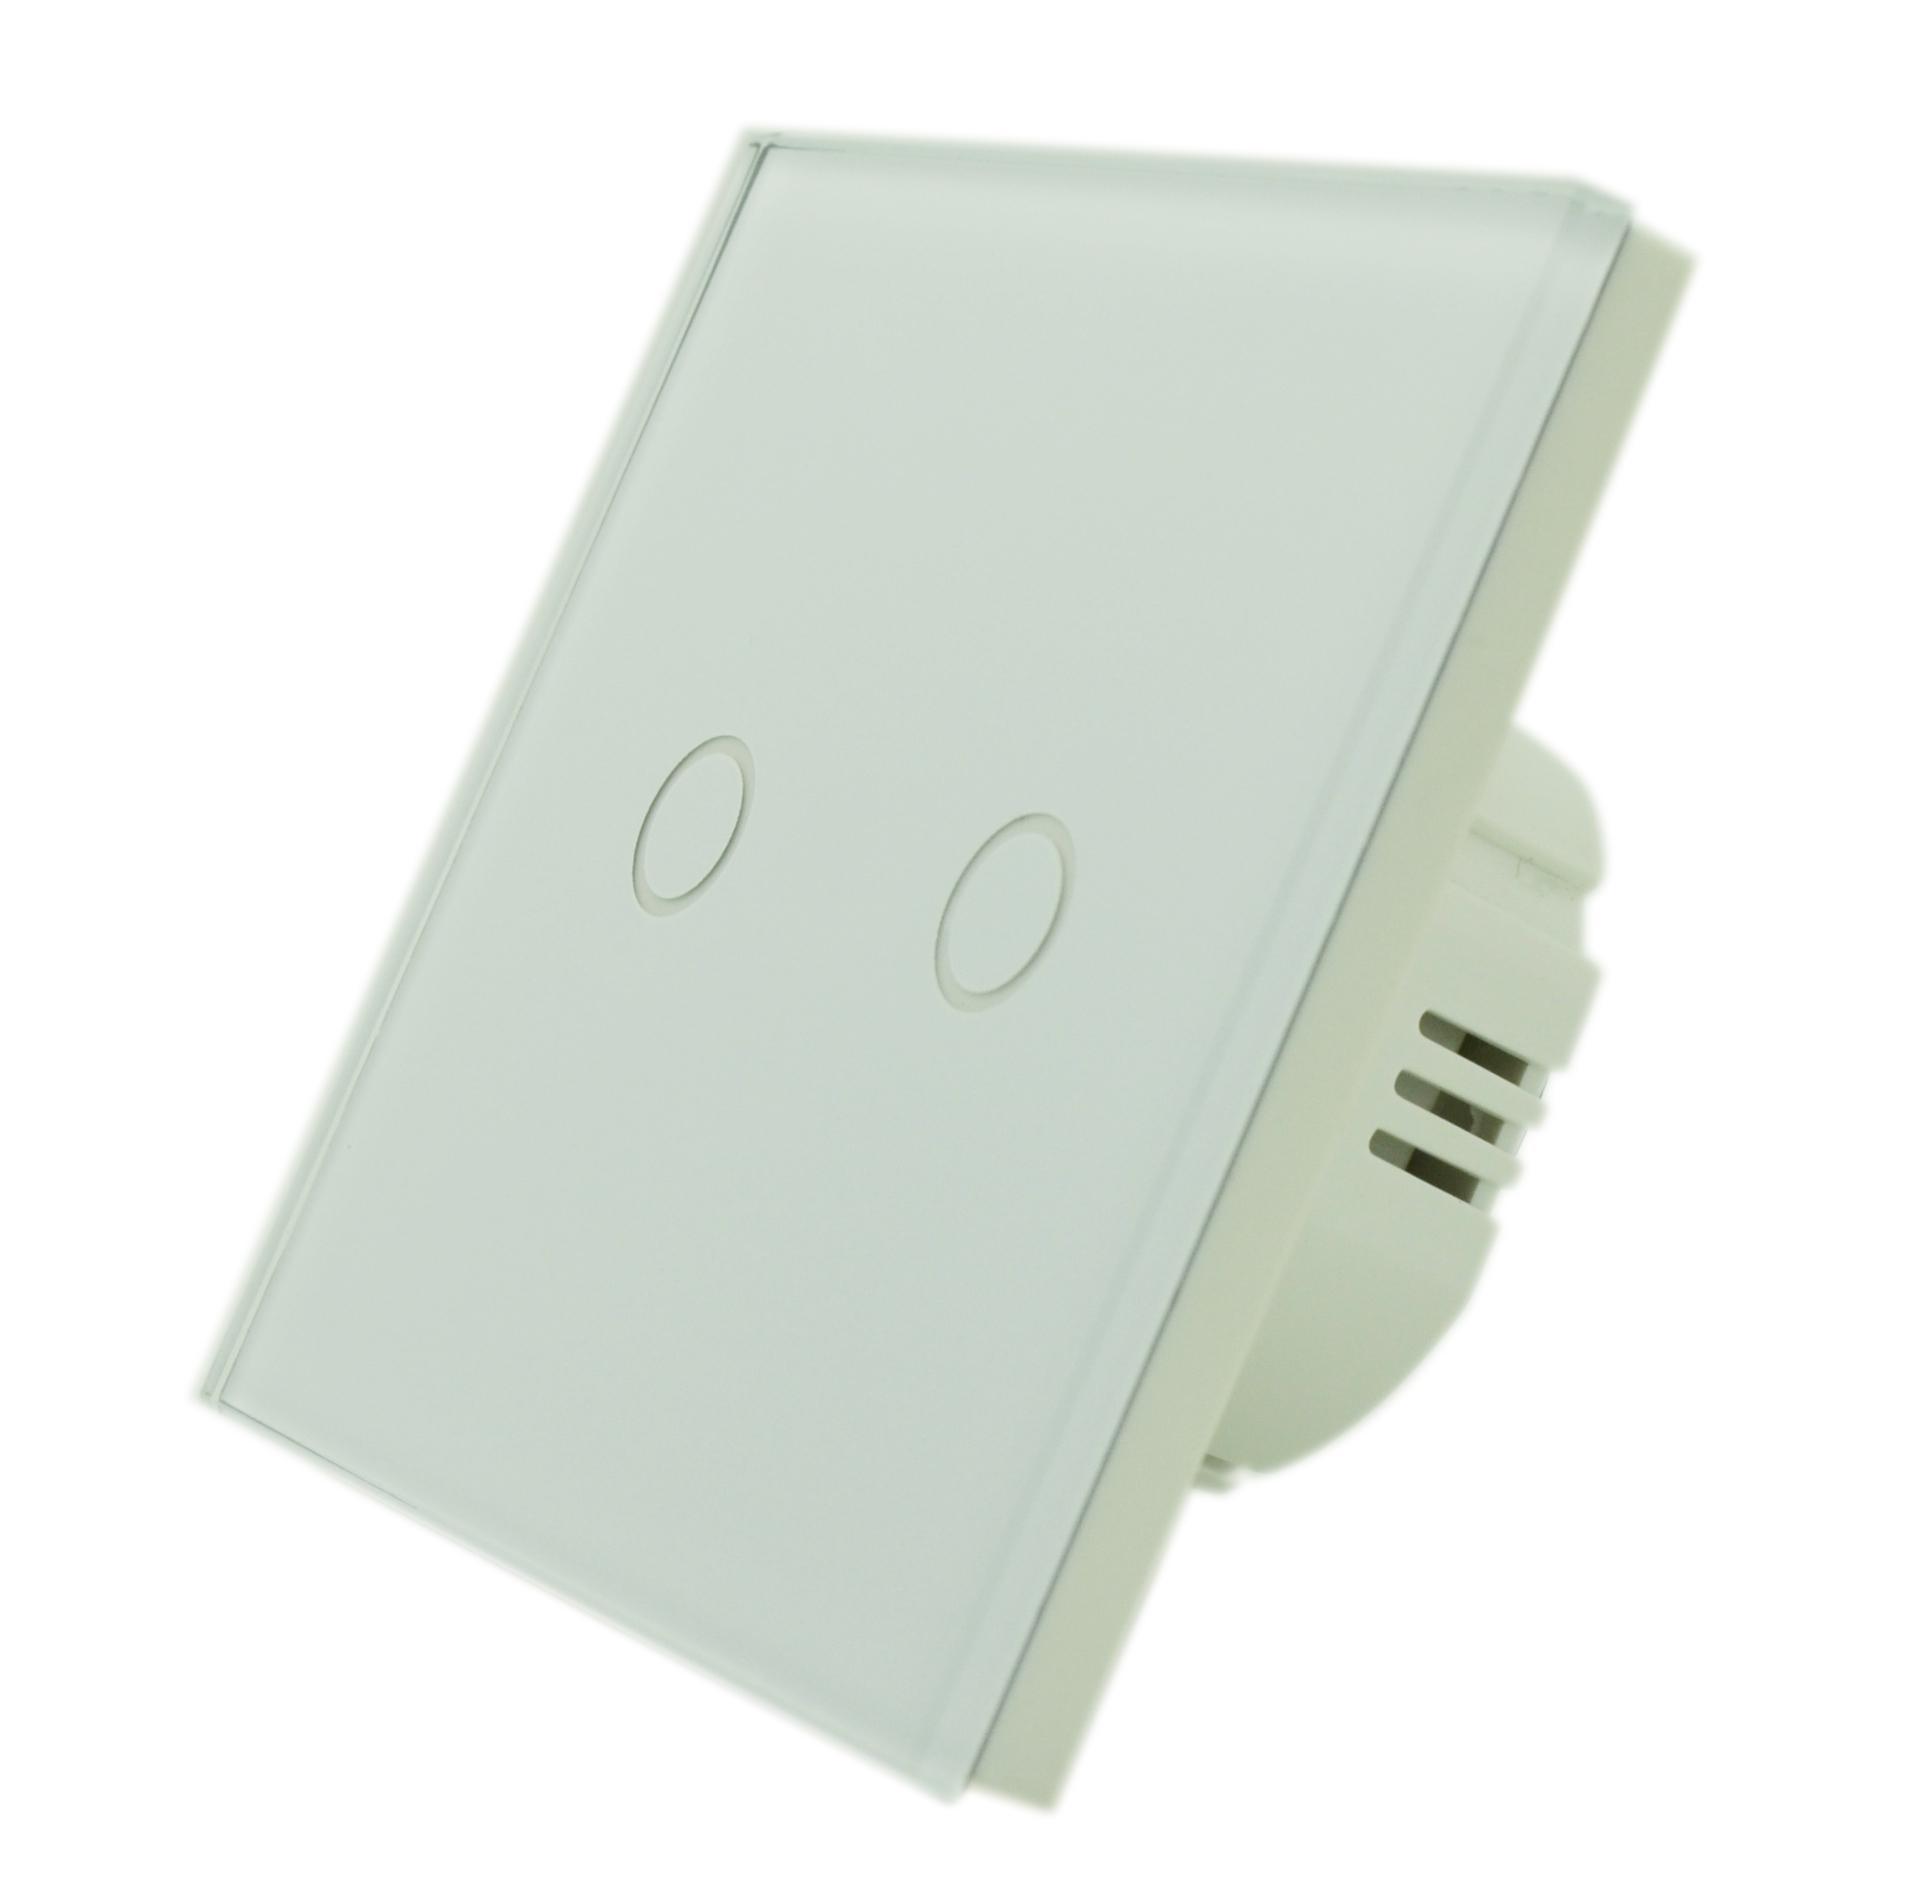 6cea2a5108e Home/Puutetundlikud lülitid/Veksellülitid/Puutetundlik 2-ahela  veksellüliti, valge. ; 